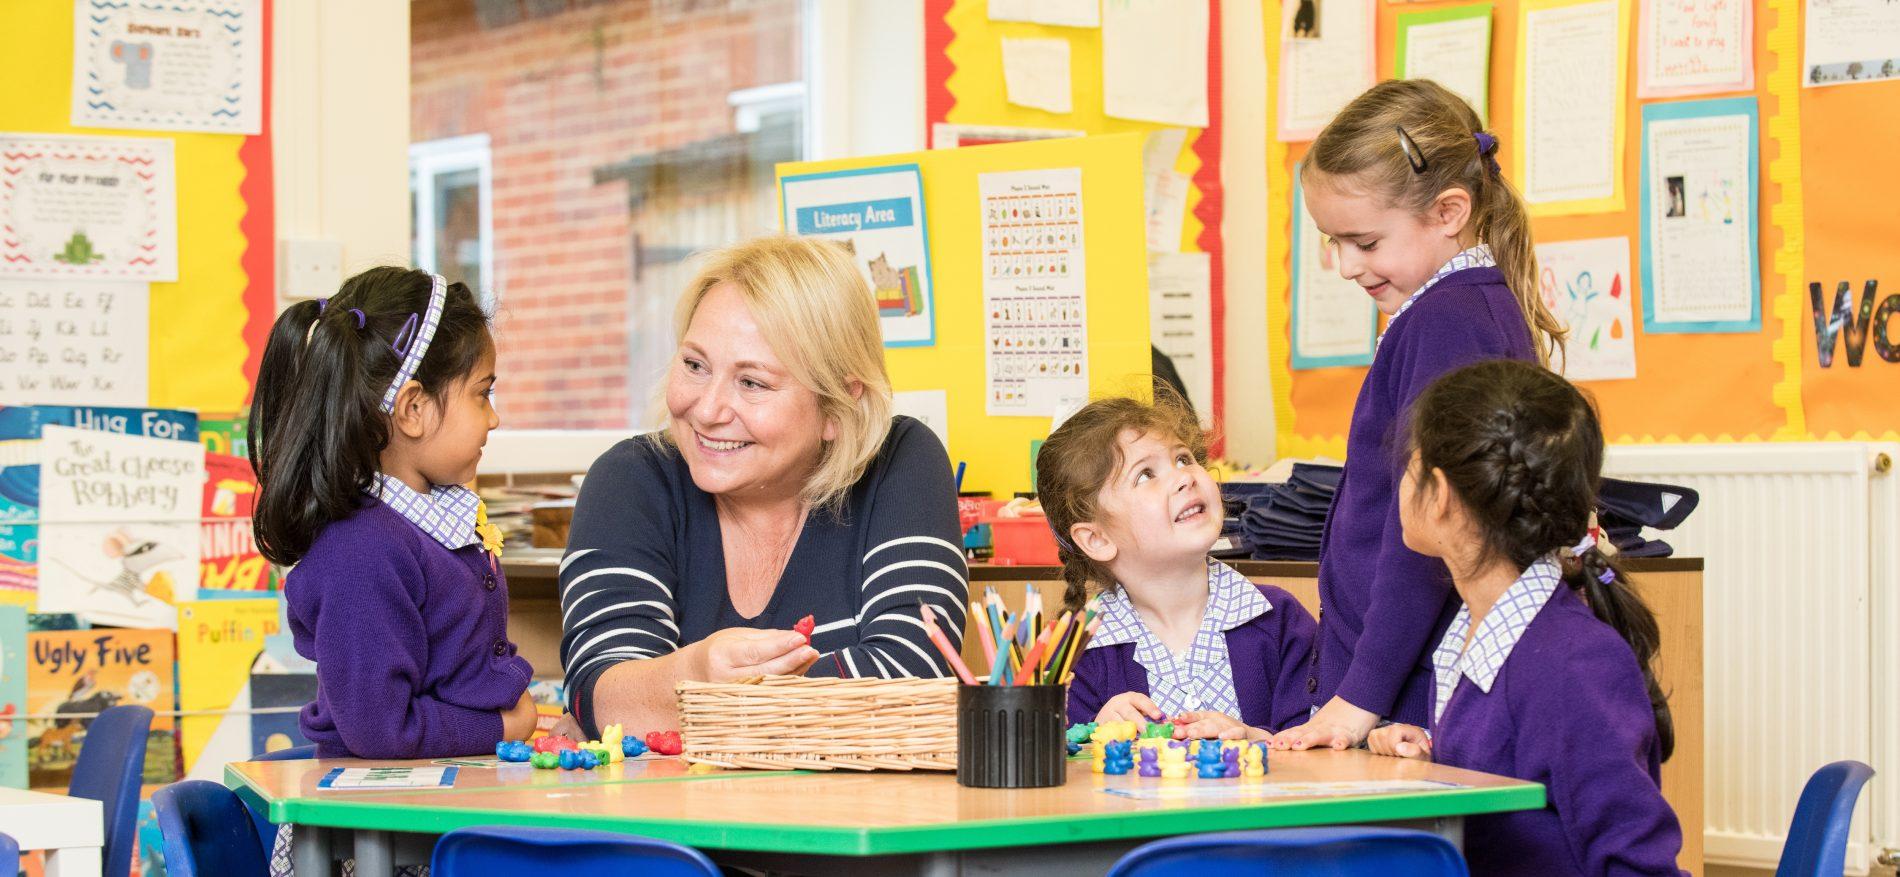 nursery girls with teacher in classroom